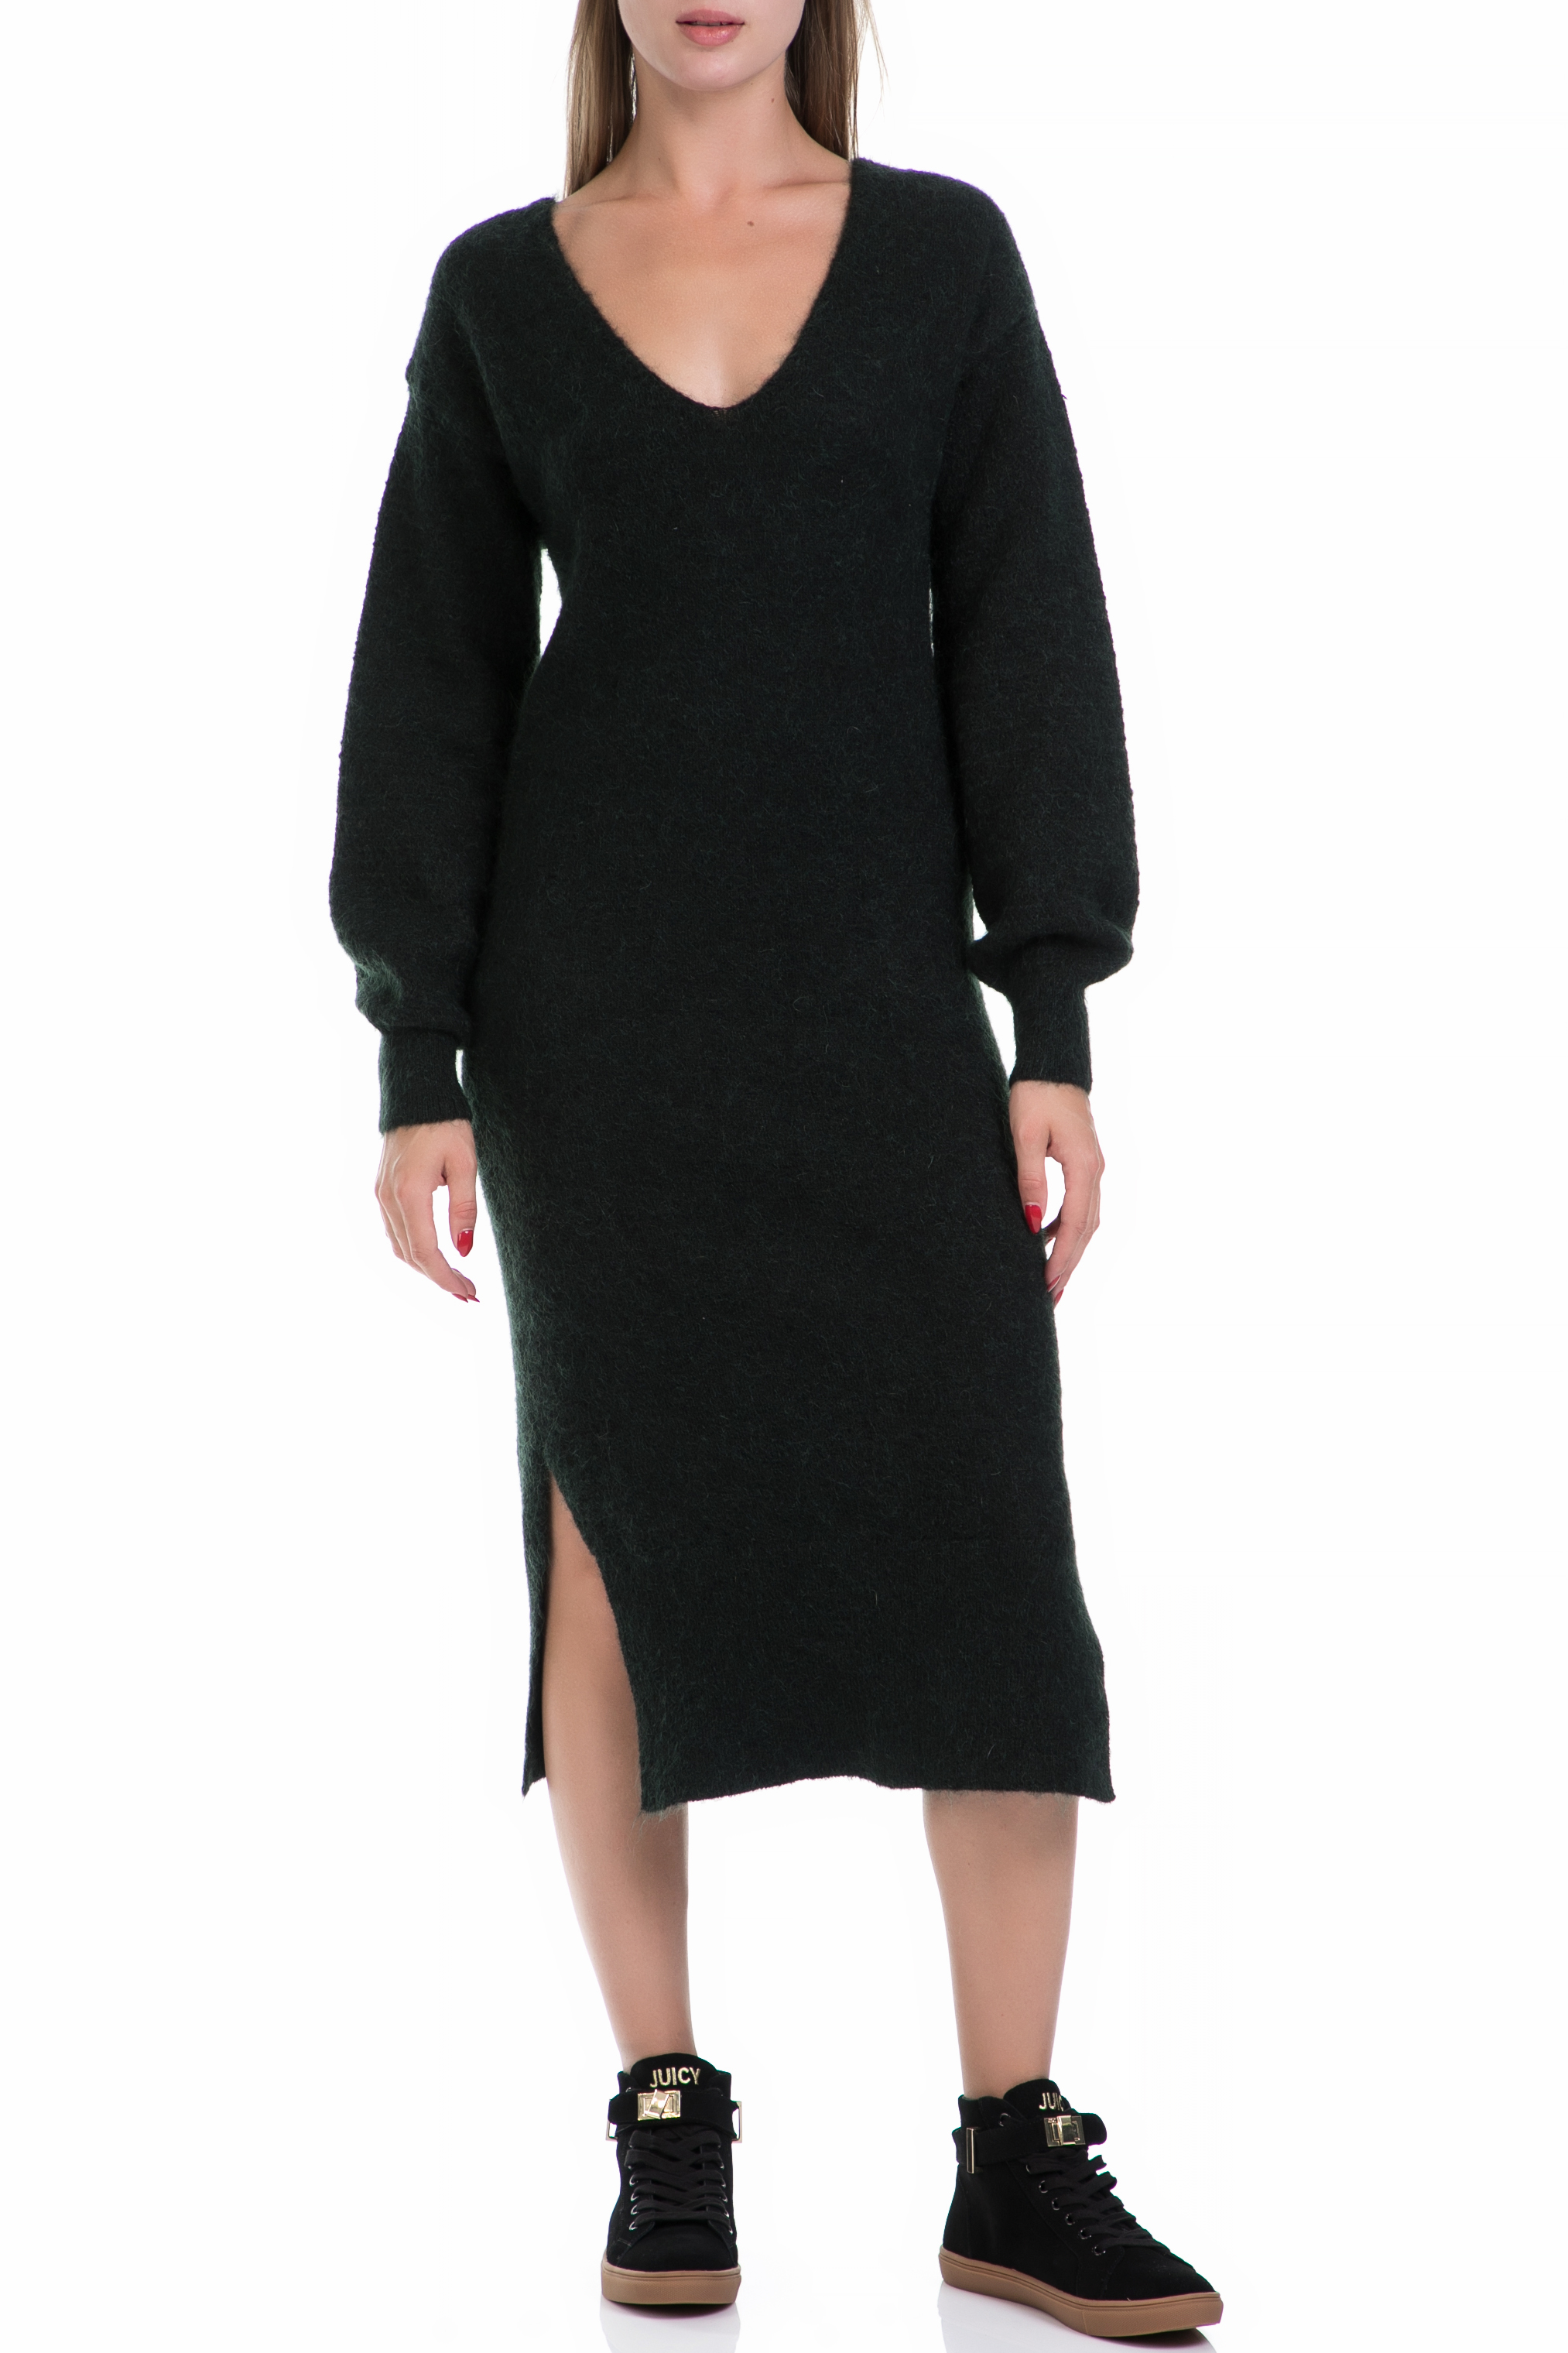 107aa76c5989 SCOTCH   SODA - Γυναικείο φόρεμα Maison Scotch γαλάζιο ⋆ pressmedoll.gr